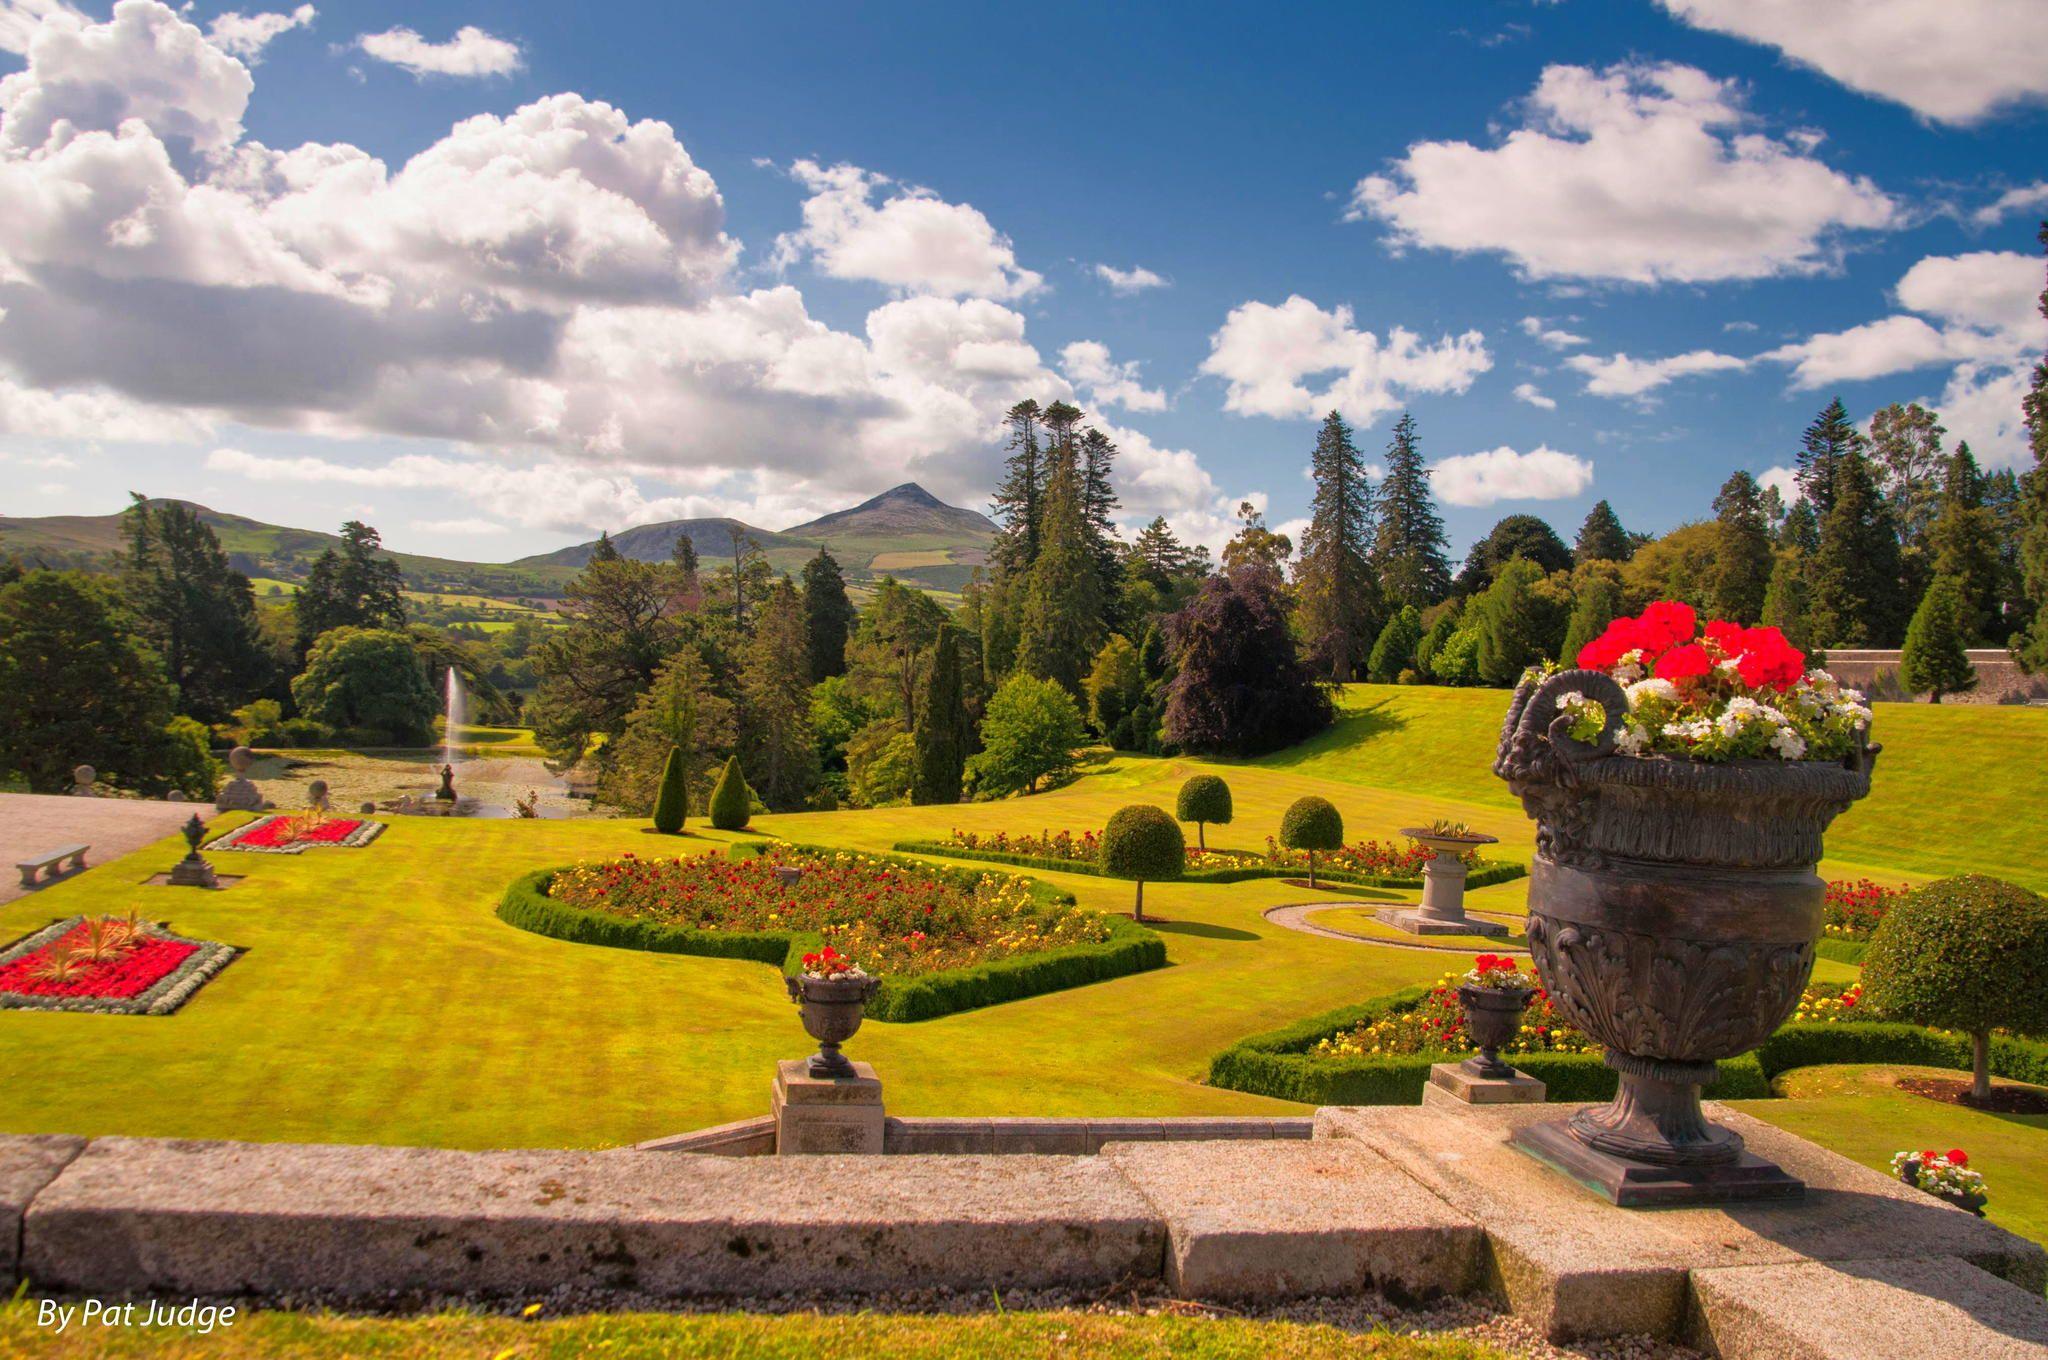 20140706-Powerscourt Gardens-0009.jpg by Pat Judge on 500px